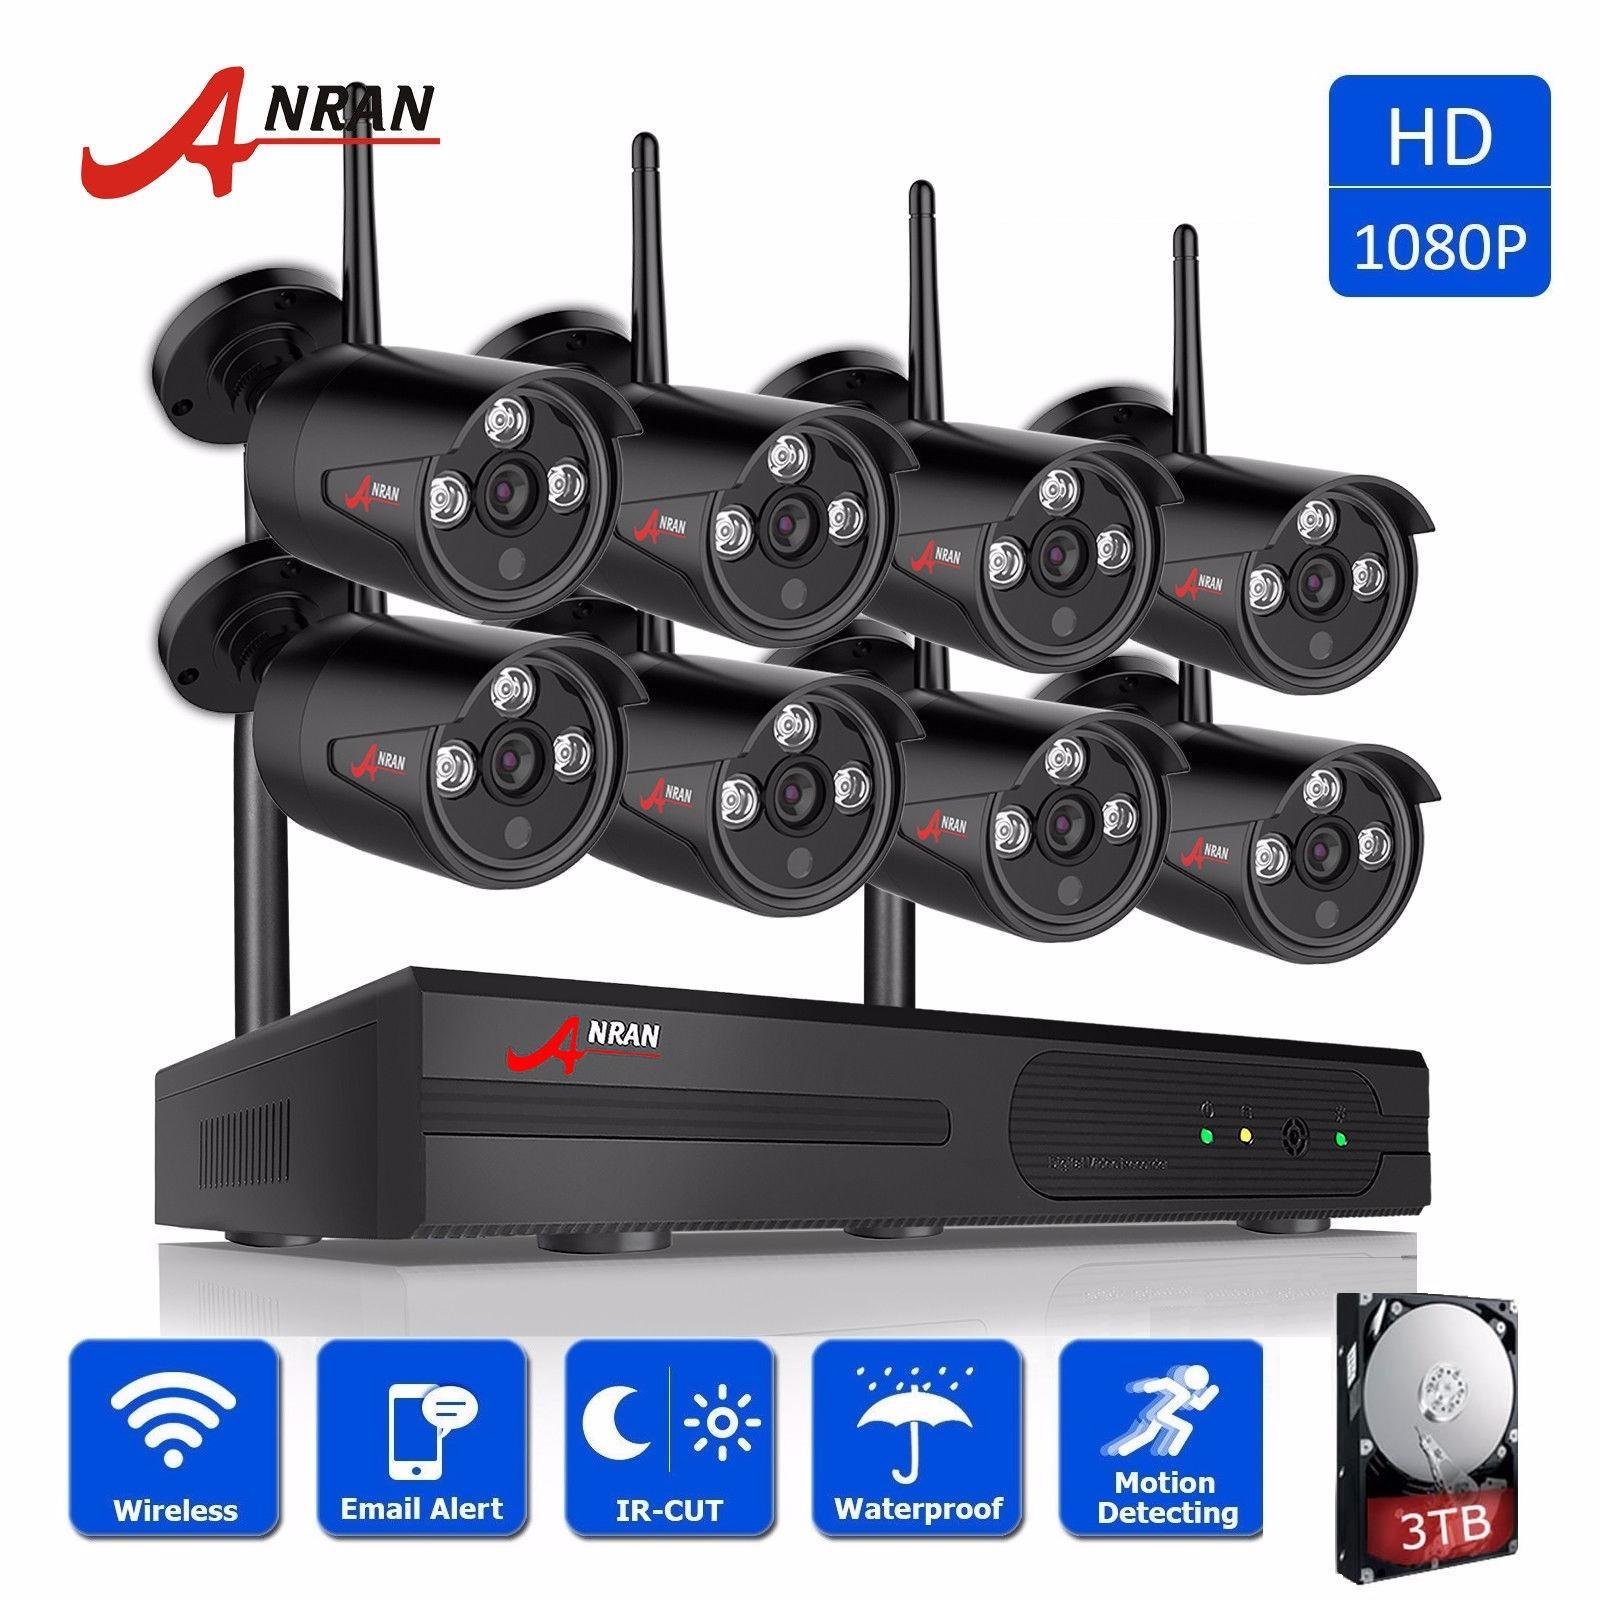 Cheap Anran 8Ch Wireless 1080P Nvr 8Pcs 2 0Mp Ir Outdoor Waterproof P2P Wifi Security Camera System Surveillance Kit